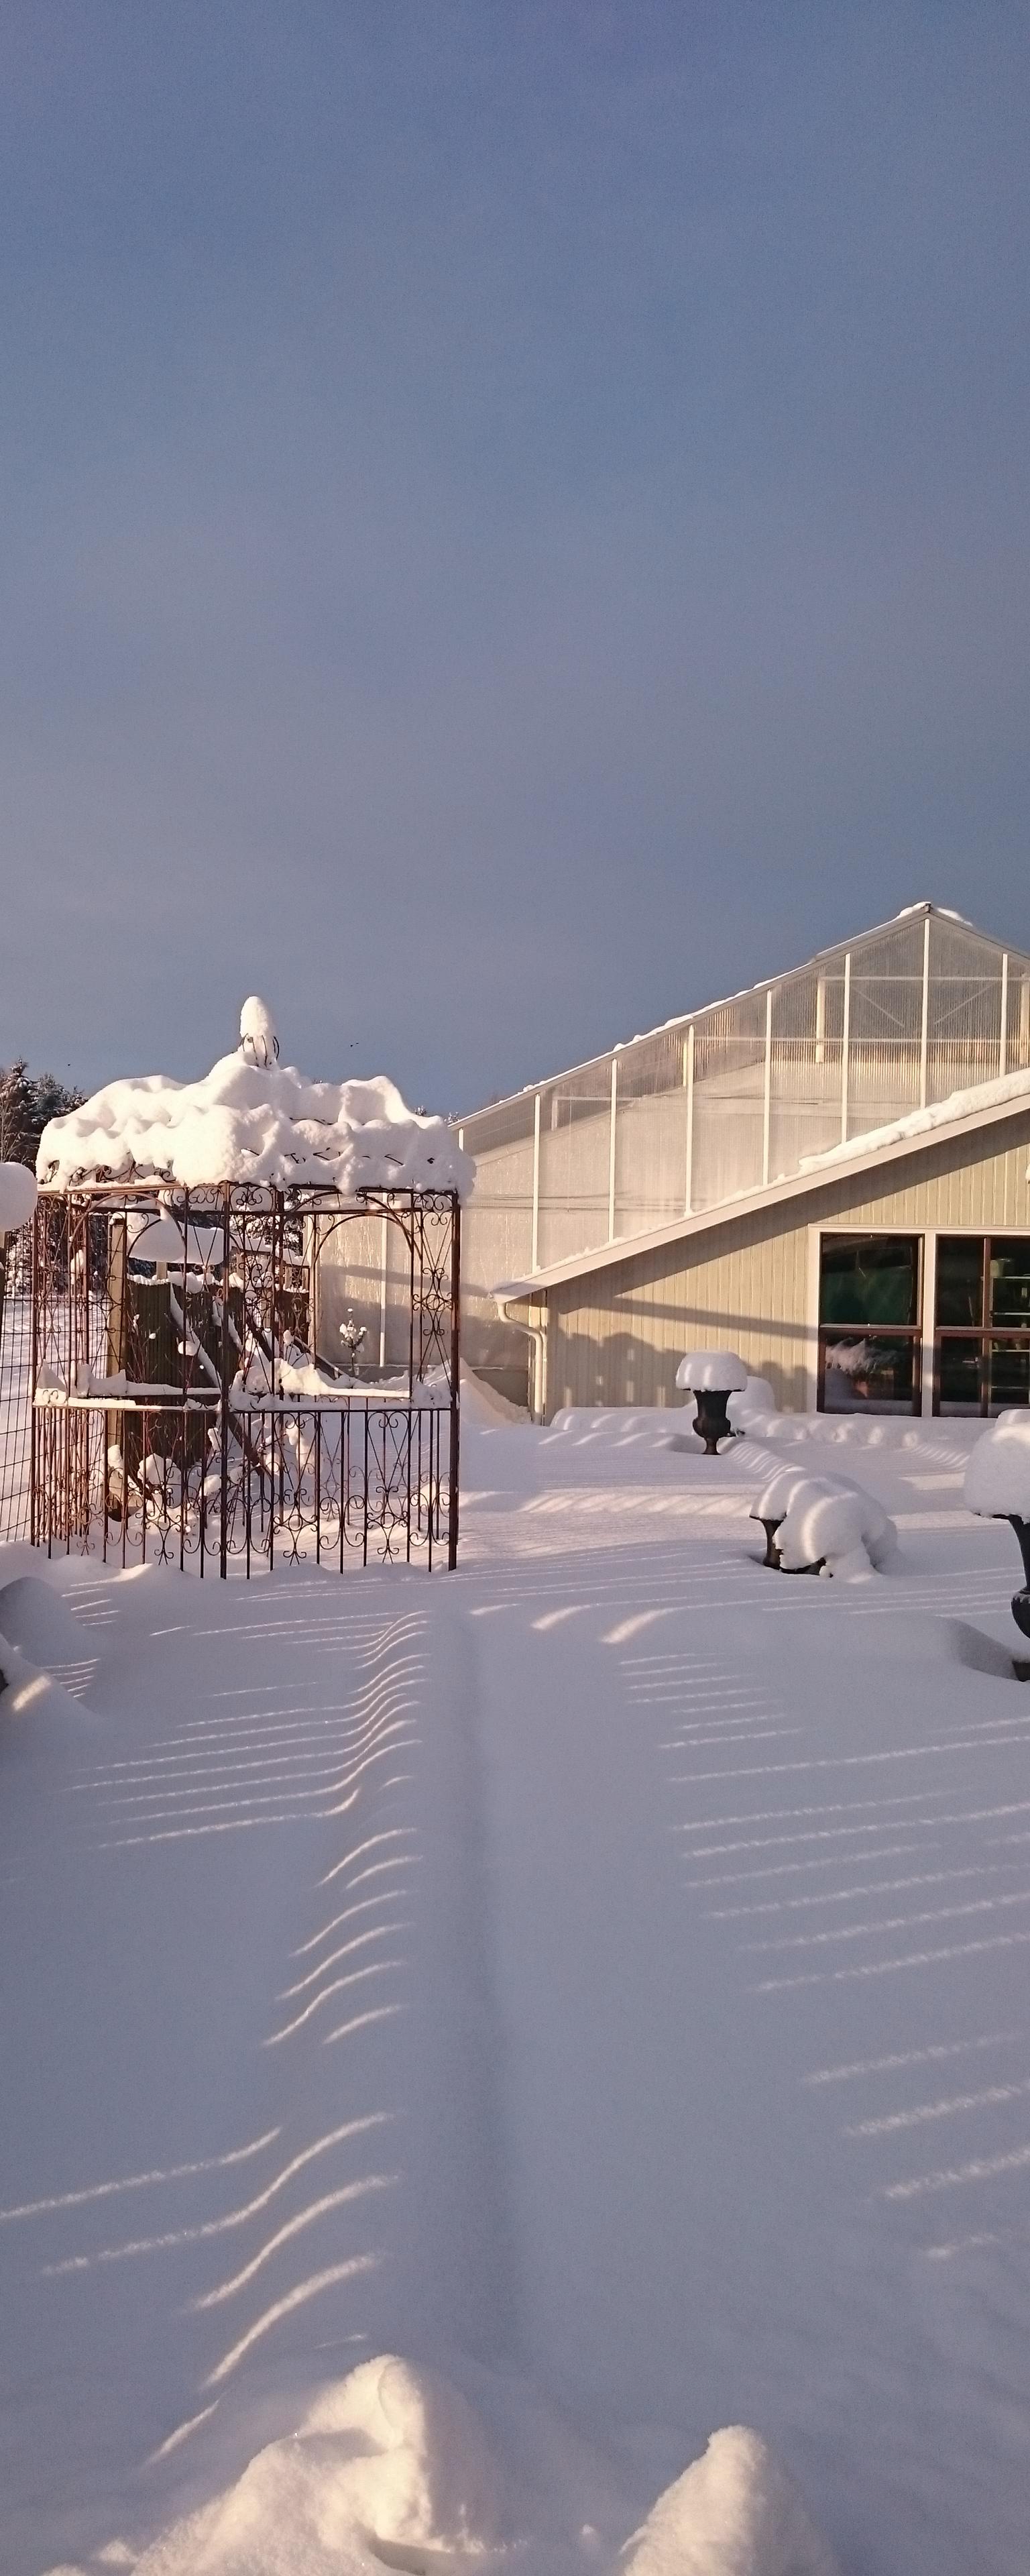 Vinter drivhus redigert_0126